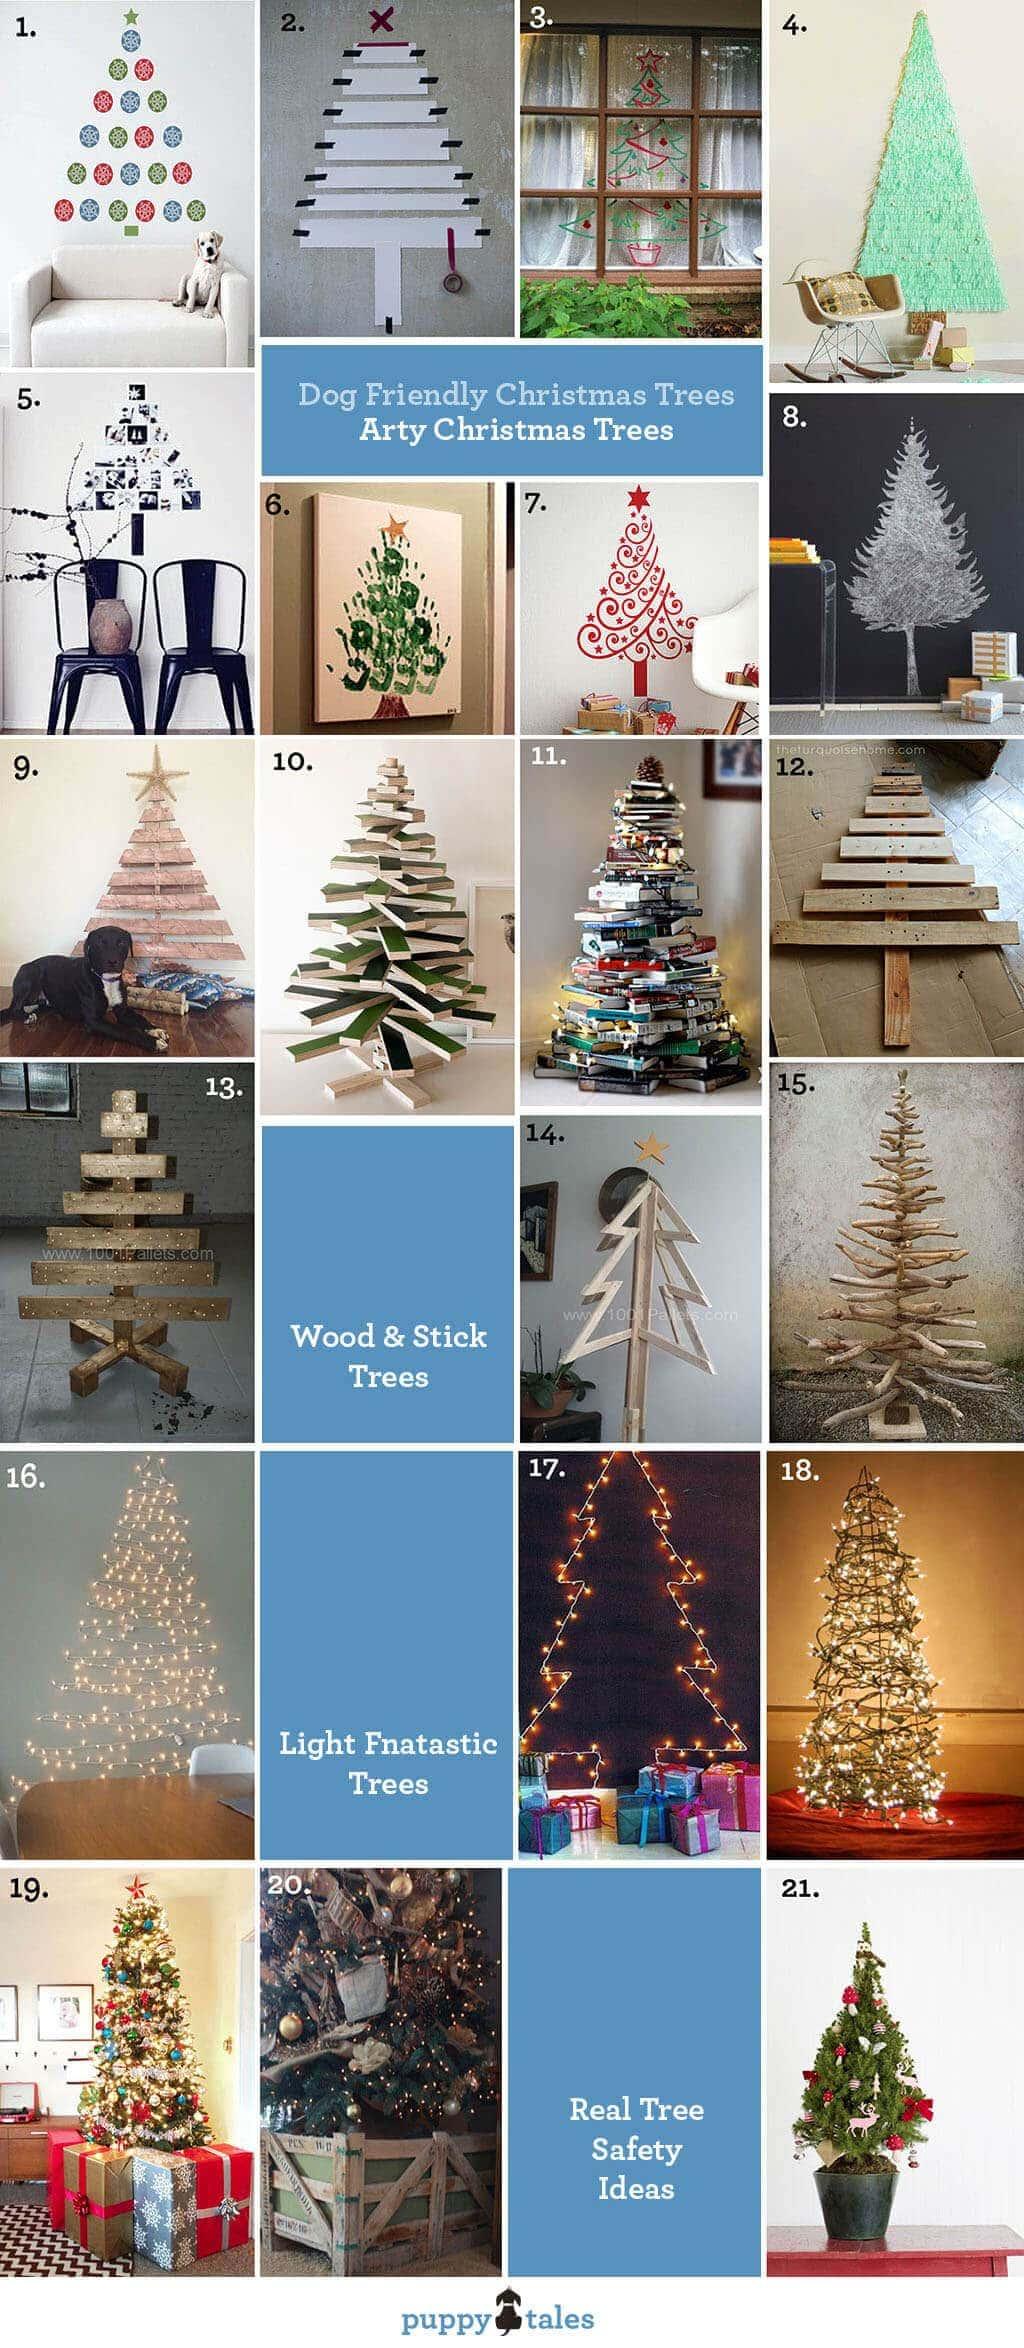 Dog Friendly Christmas Tree Alternatives